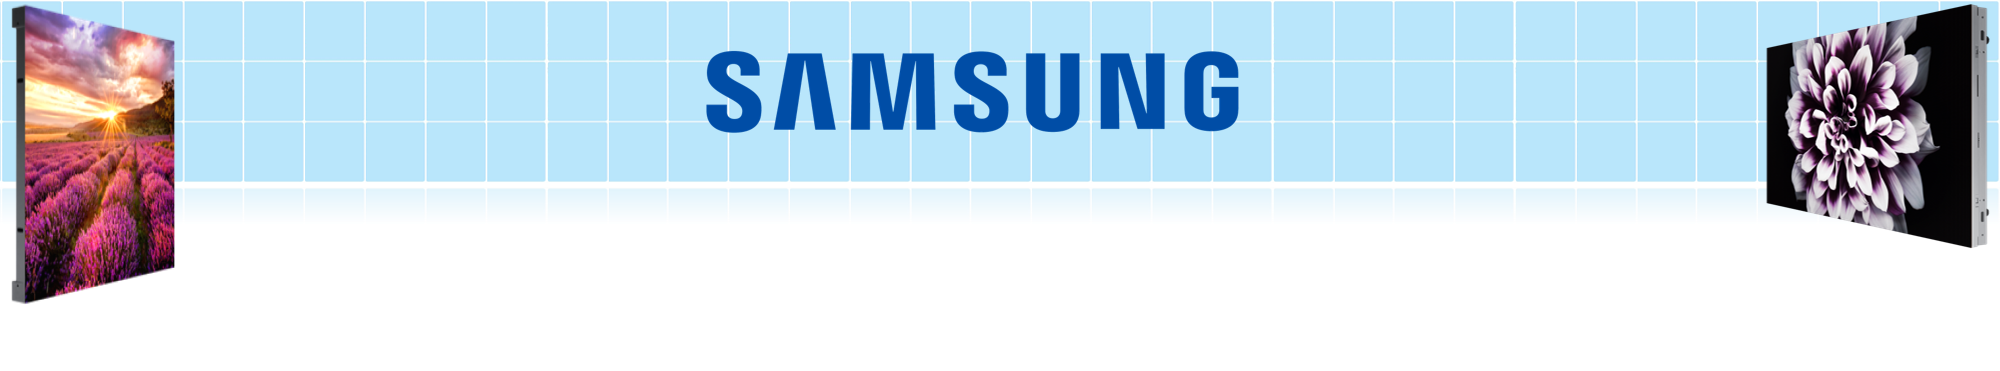 samsung-smart-signage